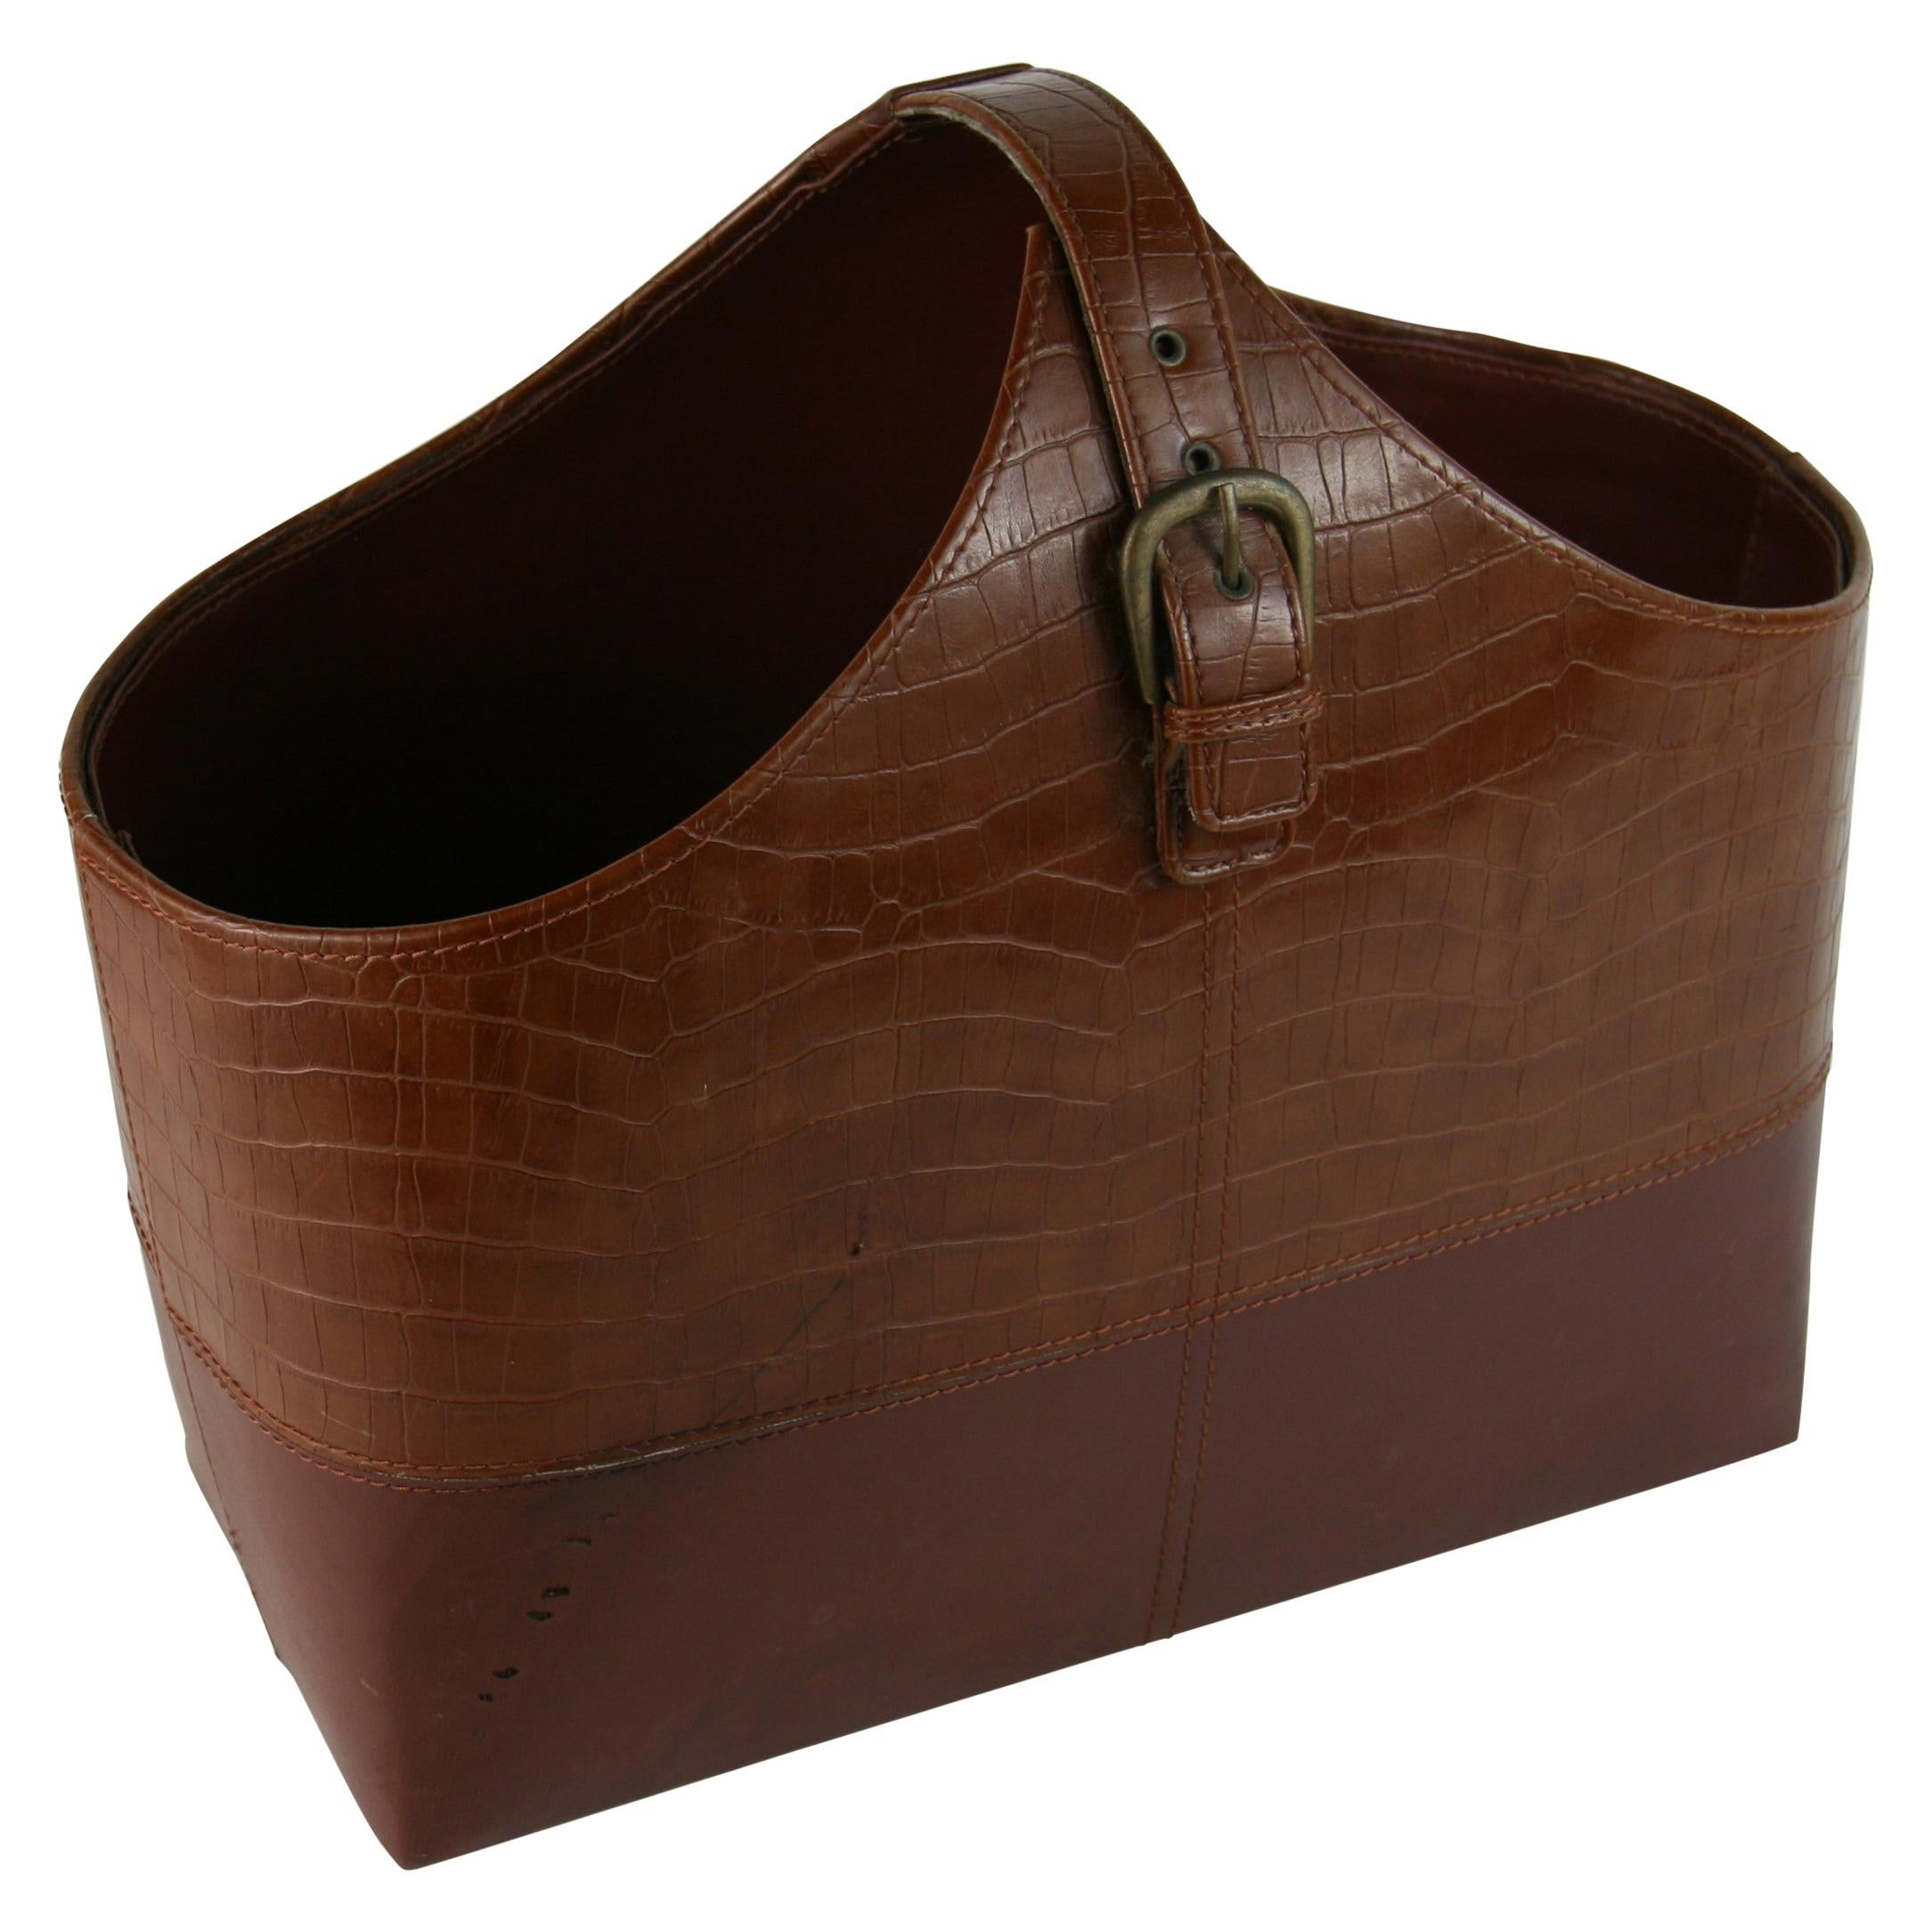 Italian Crocodile Leather Handmade Magazine Holder/Catchall\Basket